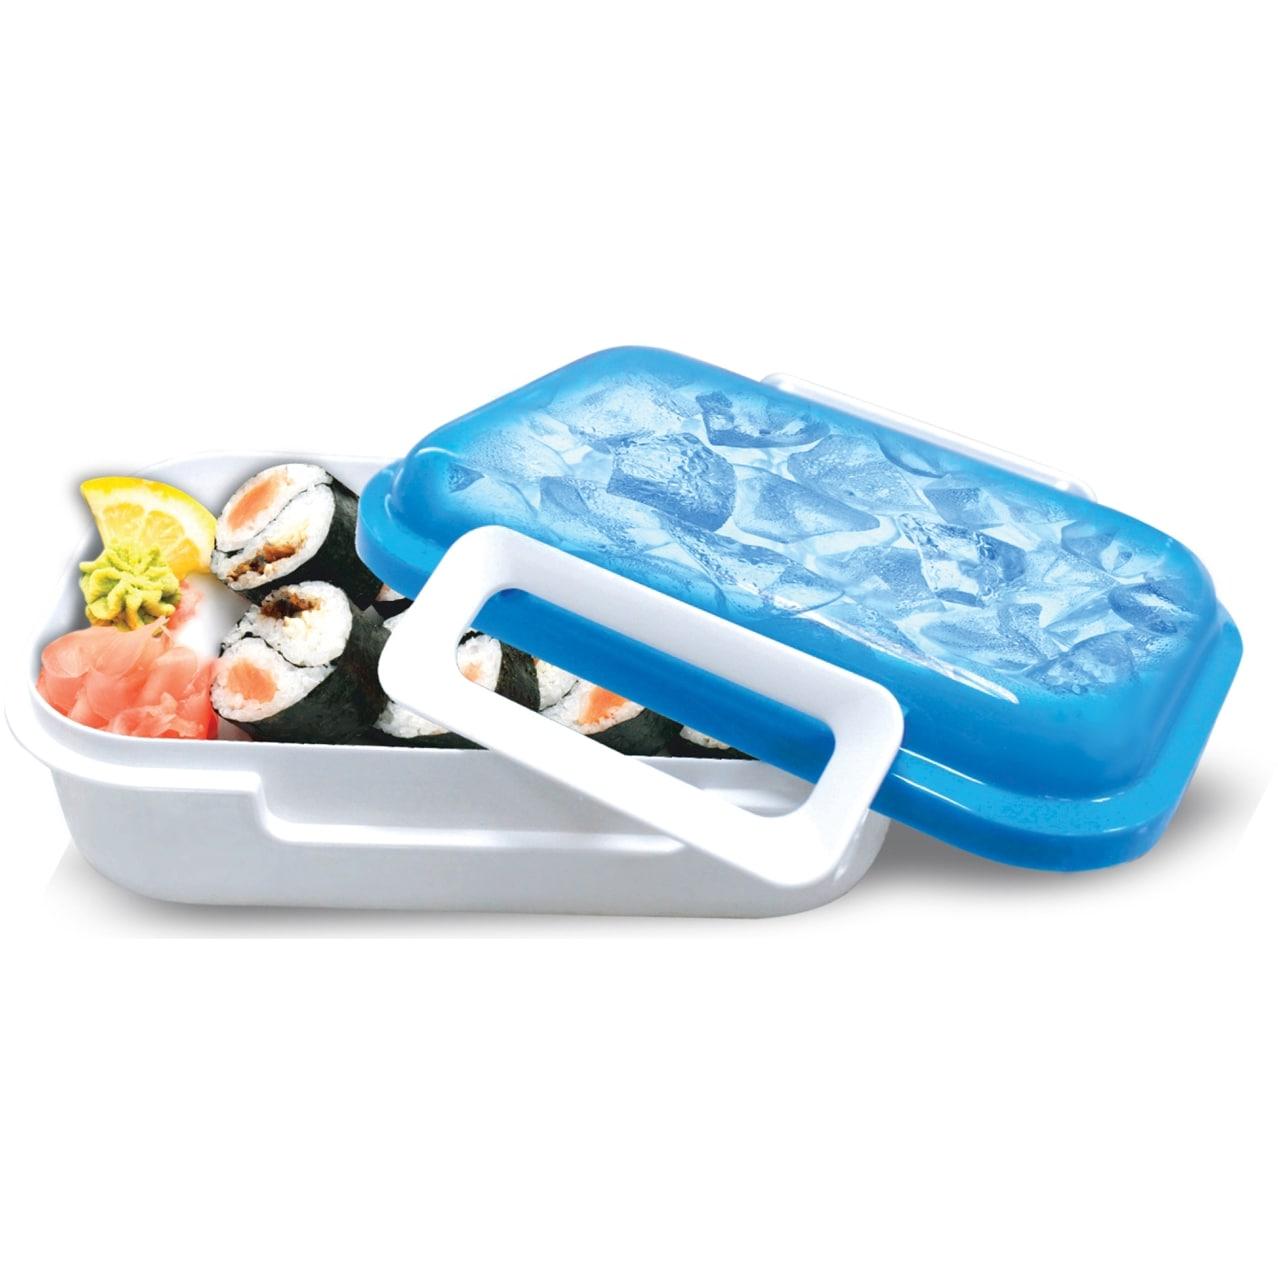 Two Elephants Portable Ice N Go (Blue/White) (Plastic)